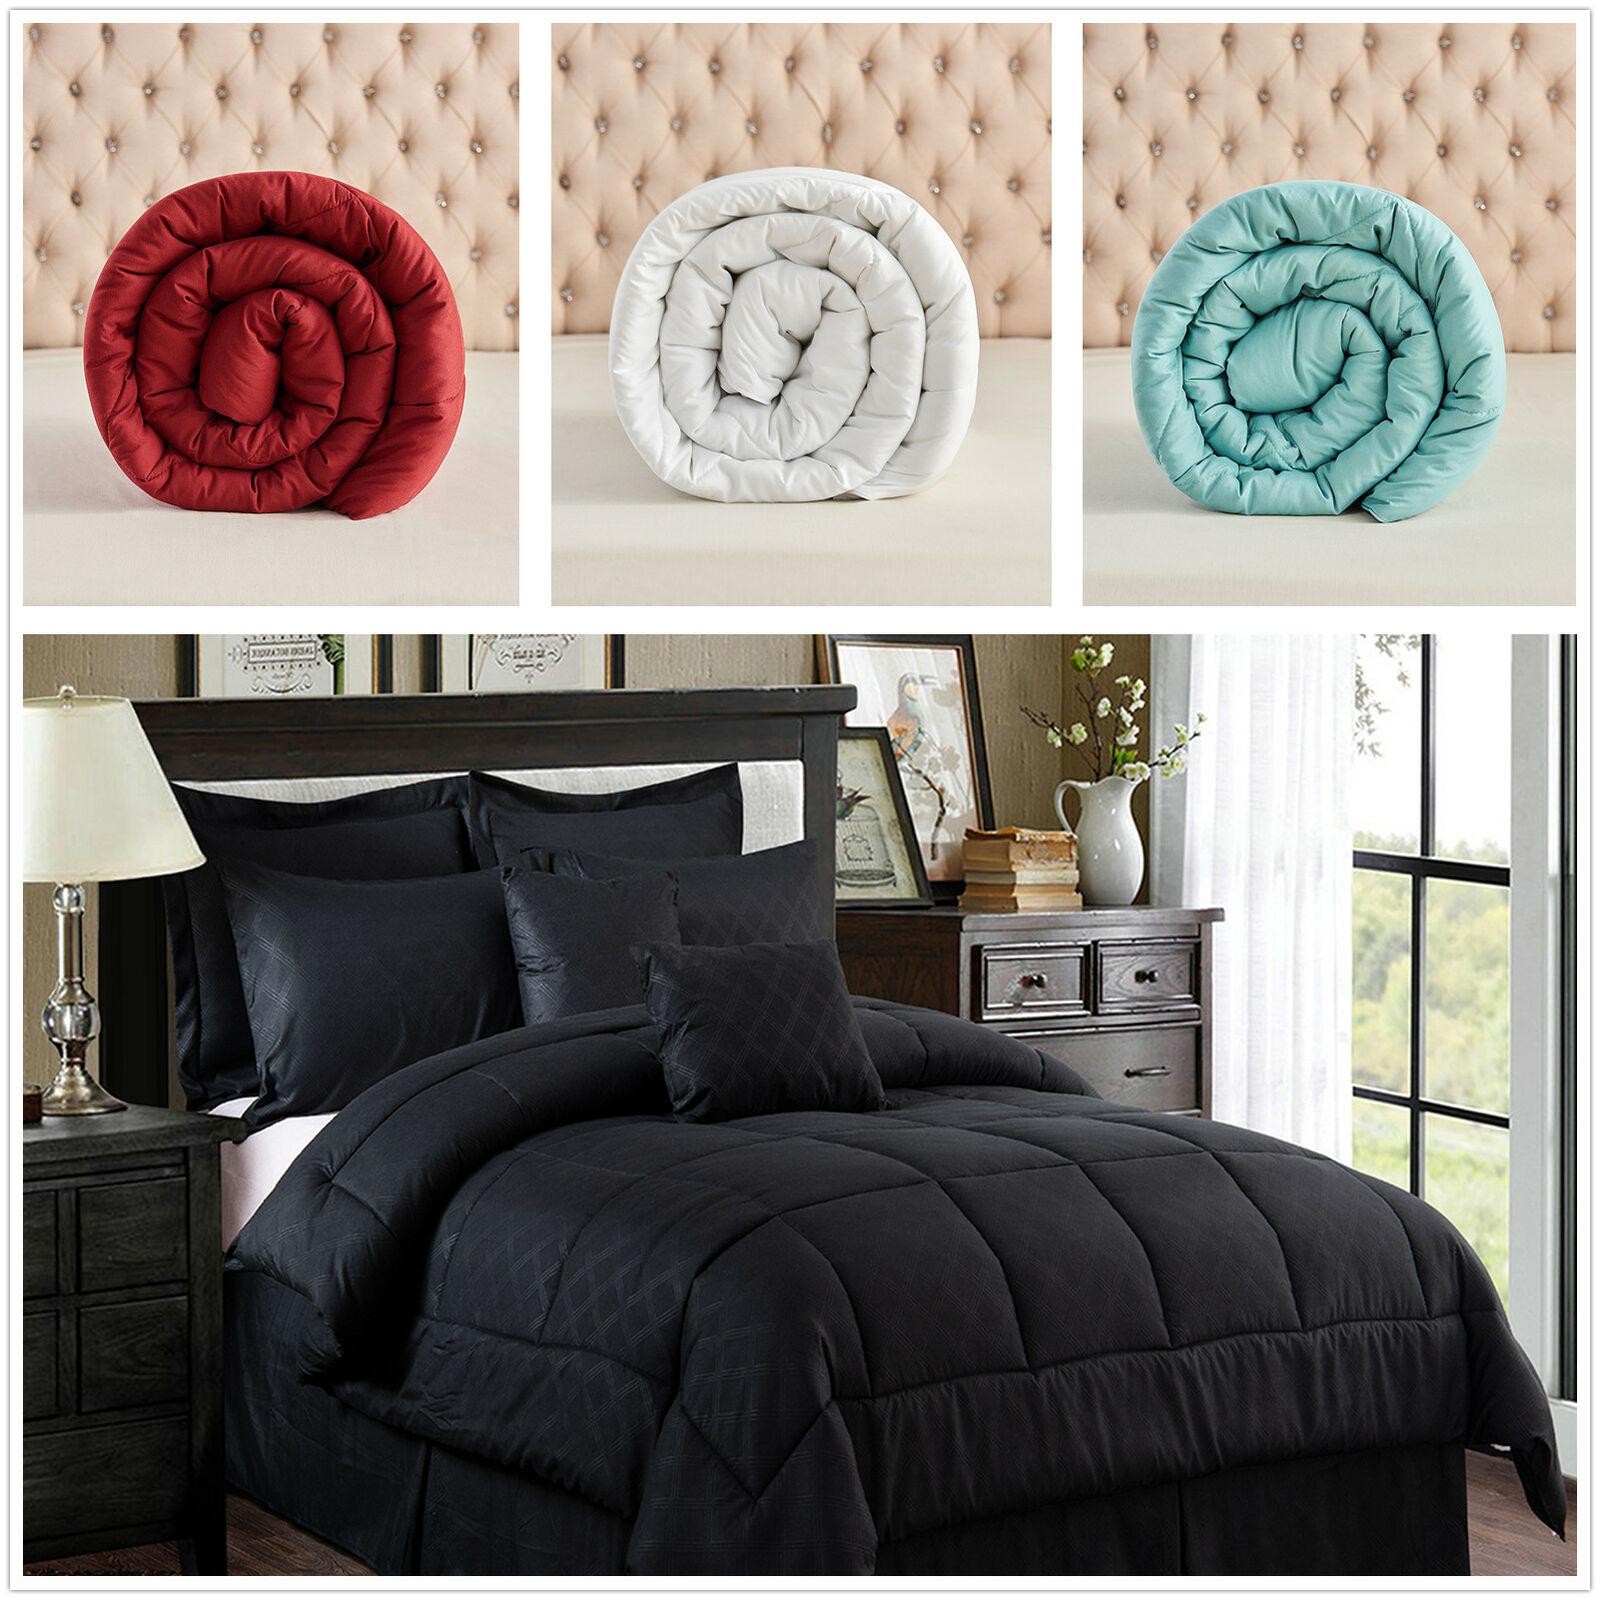 Sheex 37 5 Technology Comfort Zn Alternative Down Comforter King For Sale Online Ebay